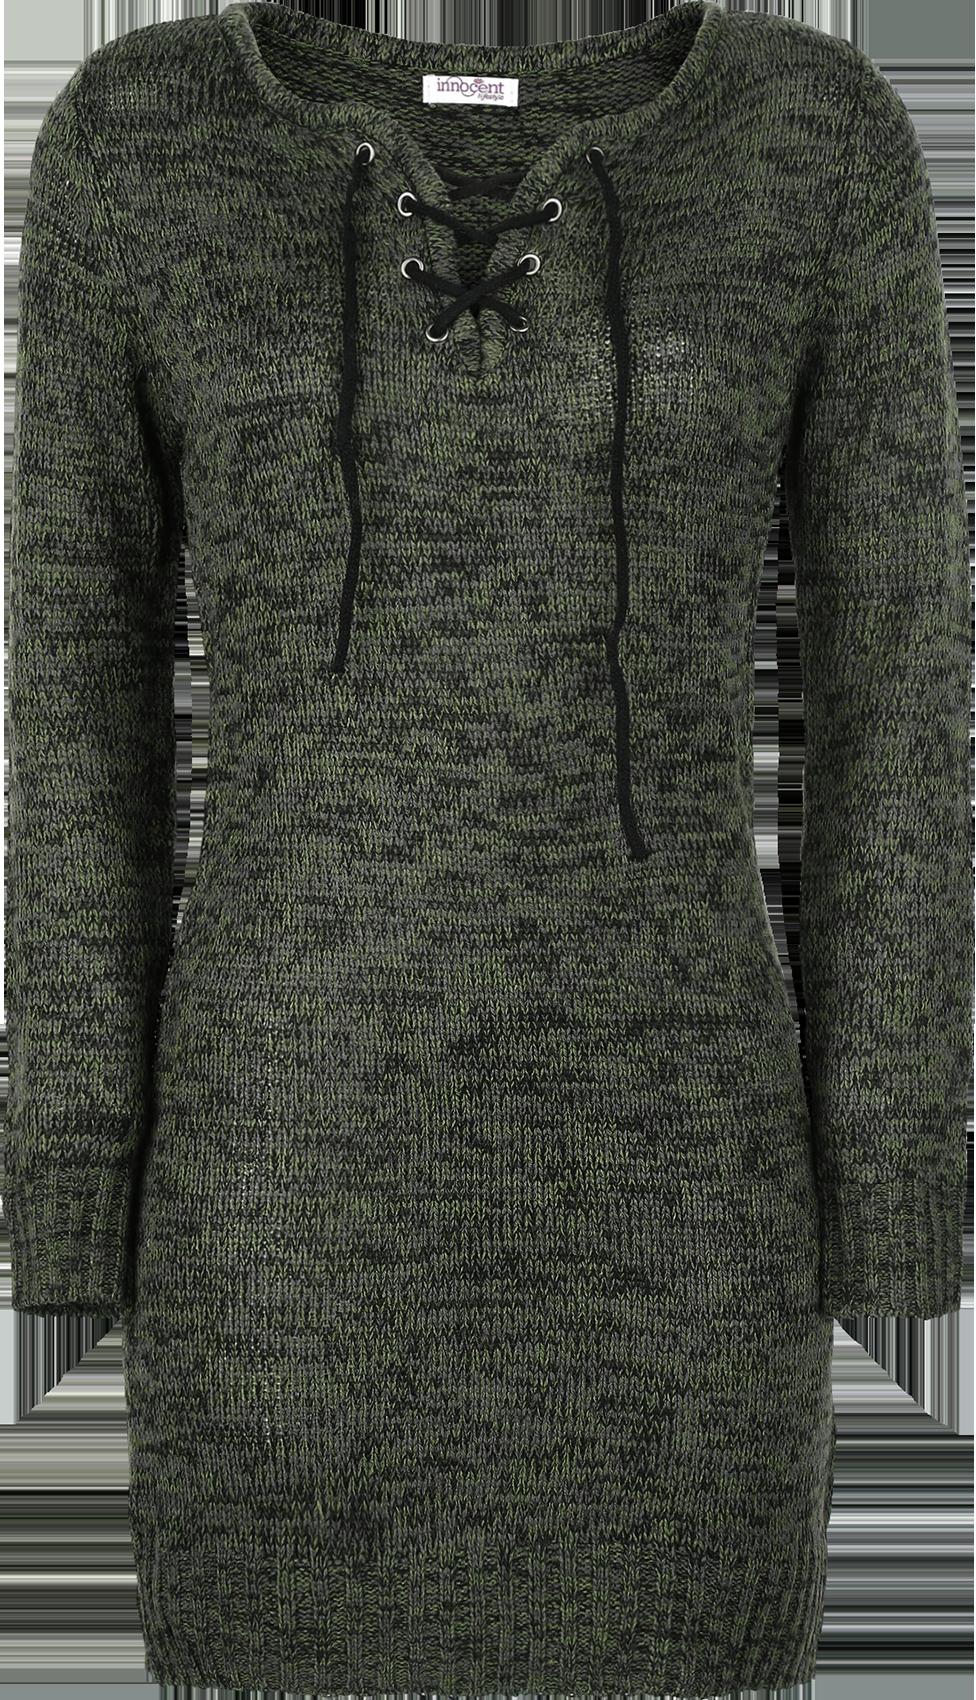 Innocent Lana Top Sweter damski oliwkowy